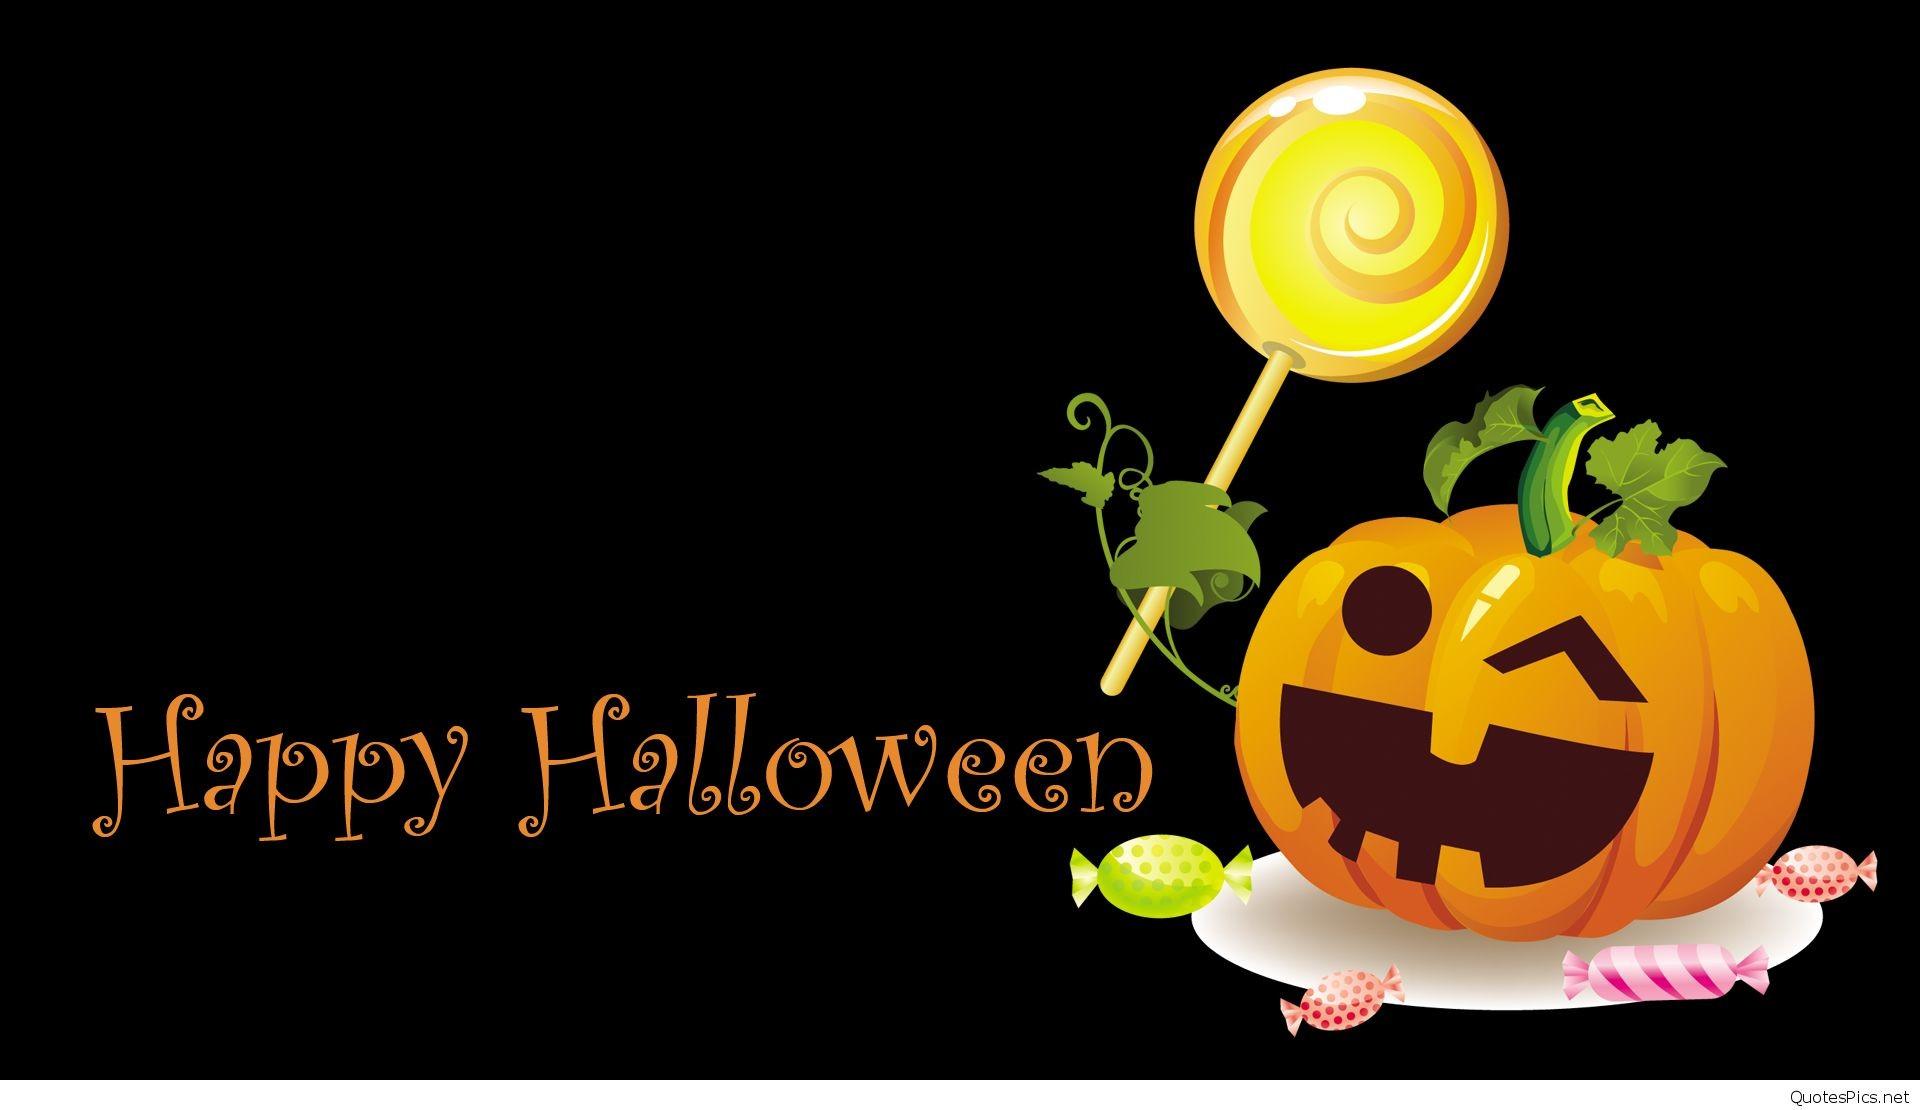 Happy Halloween wallpaper ·① Download free stunning full ...